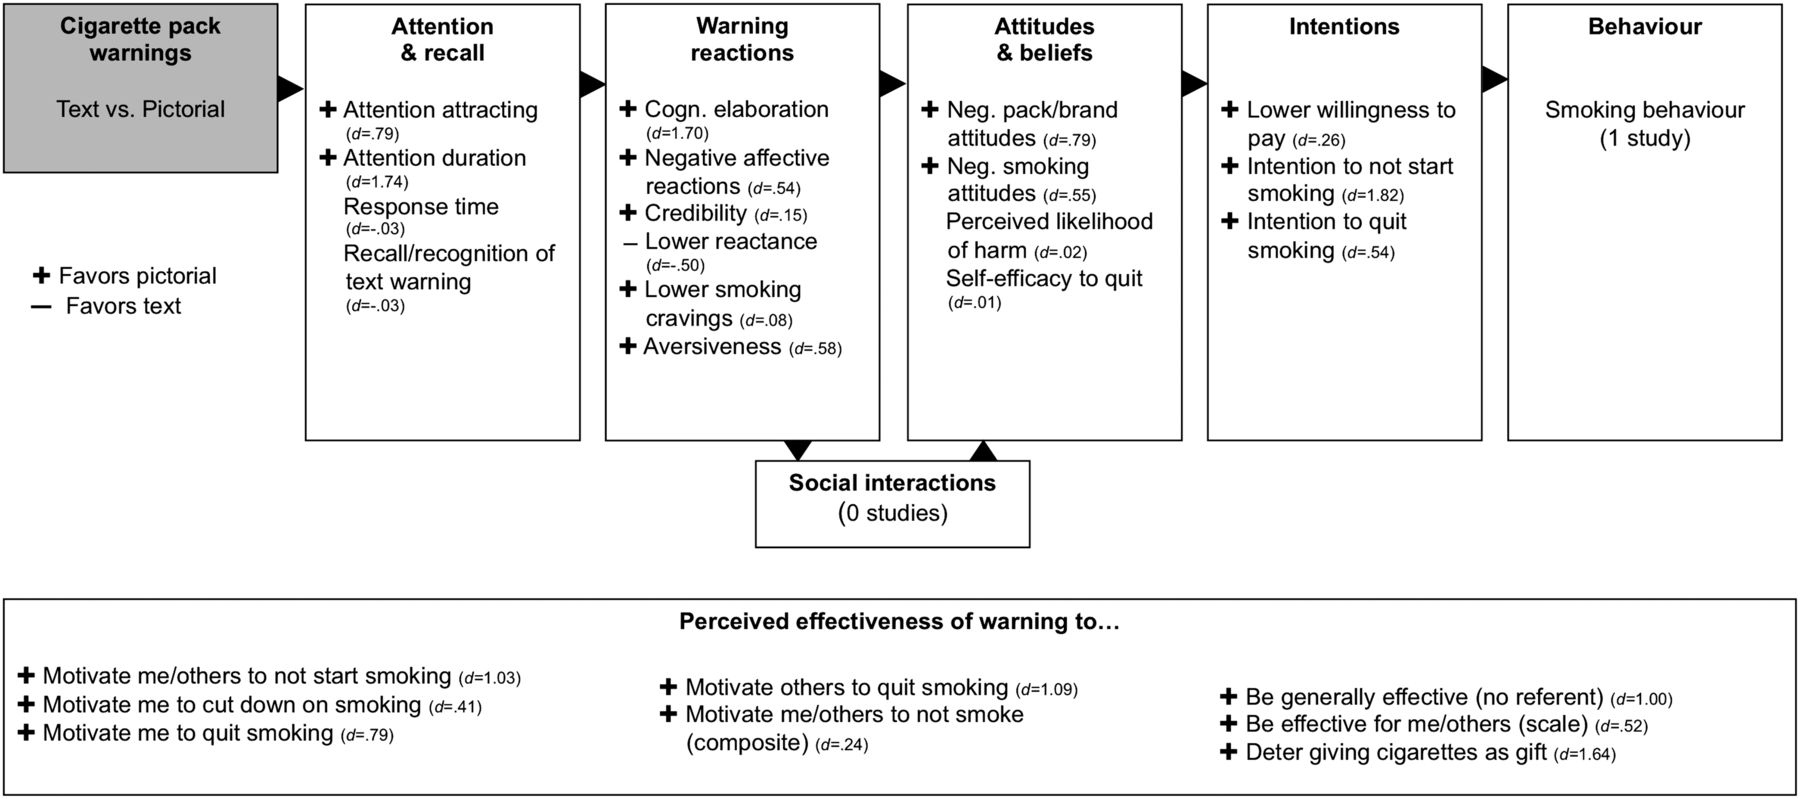 Pictorial cigarette pack warnings: a meta-analysis of